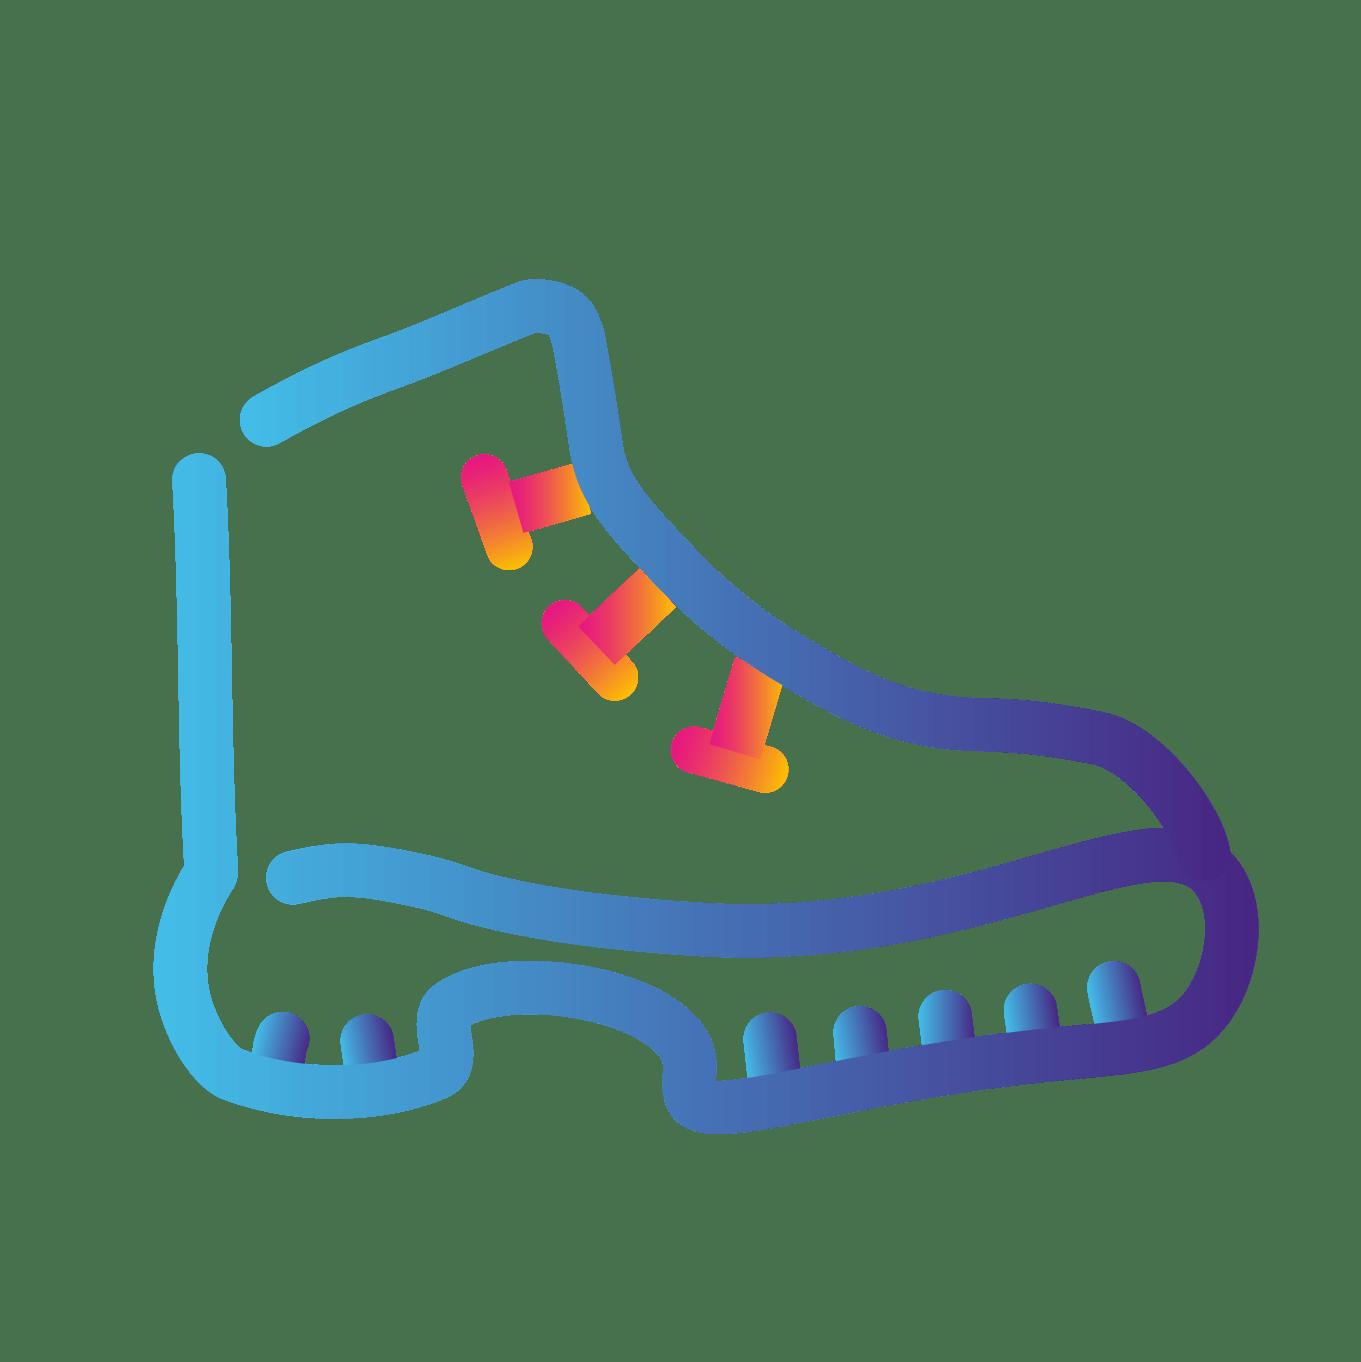 walking boot icon